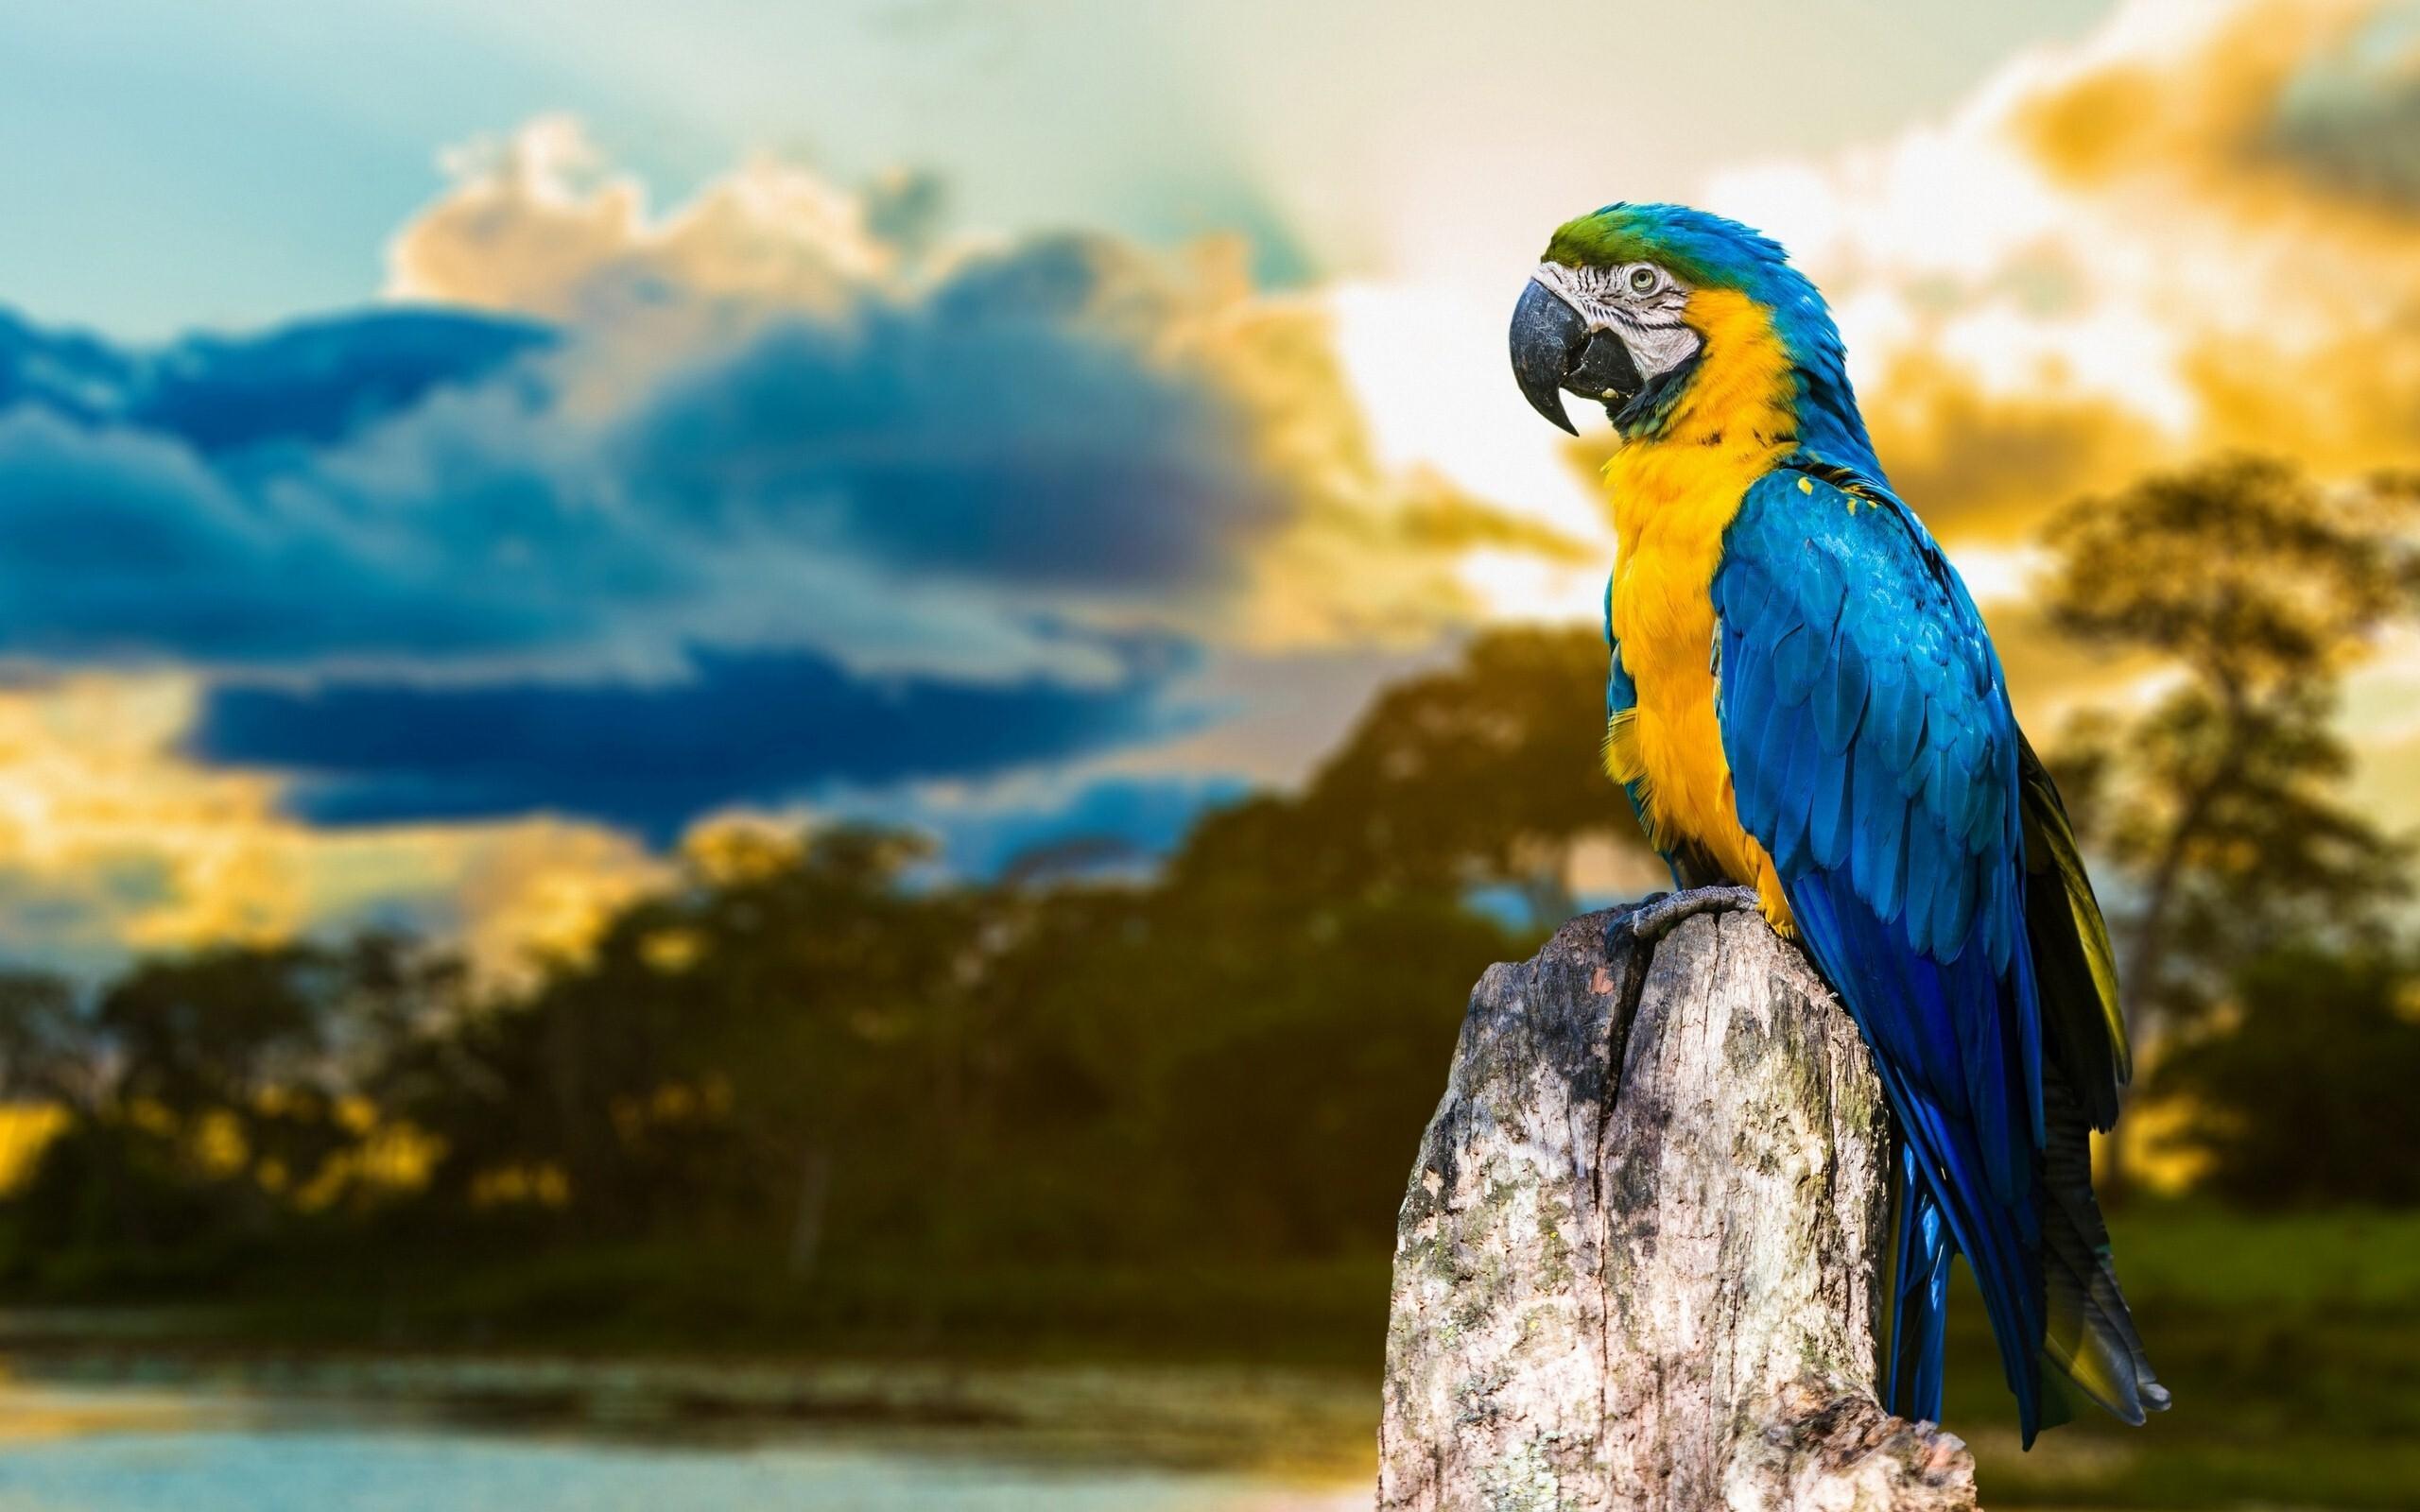 Parrot wallpapers free download colorful birds hd desktop images parrot wallpapers voltagebd Images